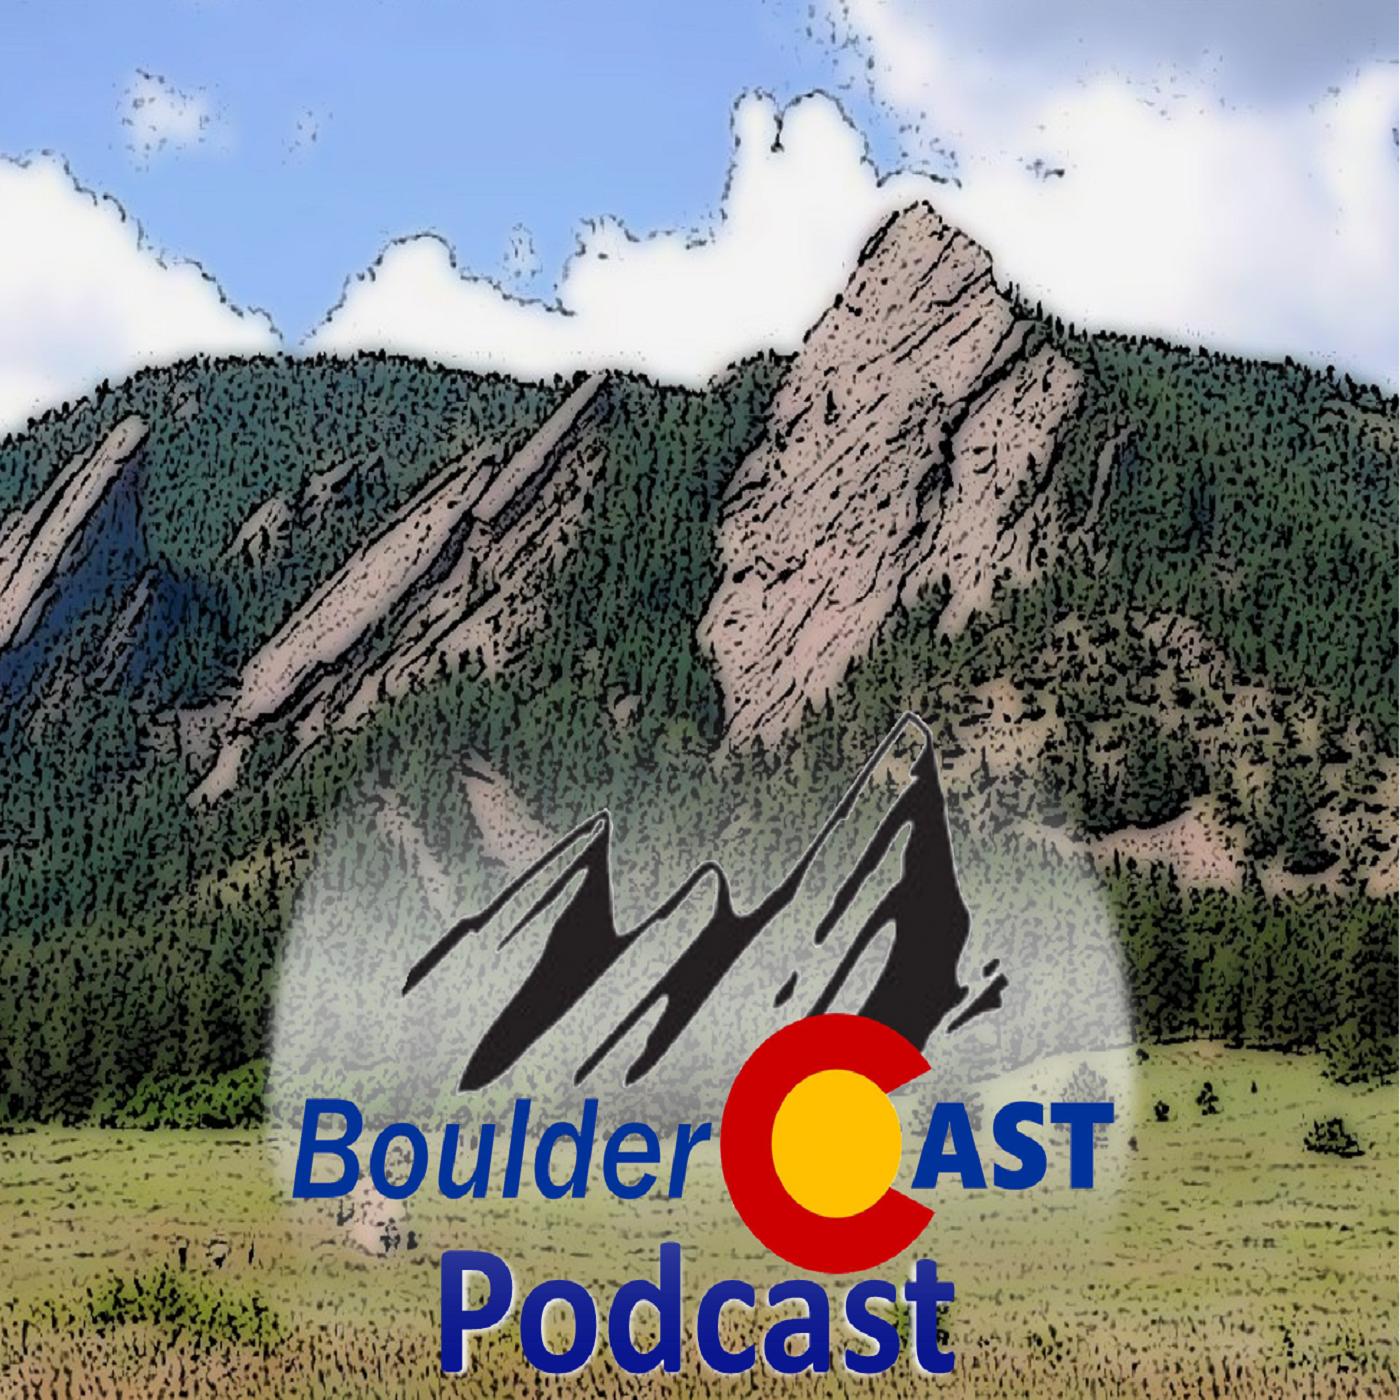 BoulderCAST Podcast